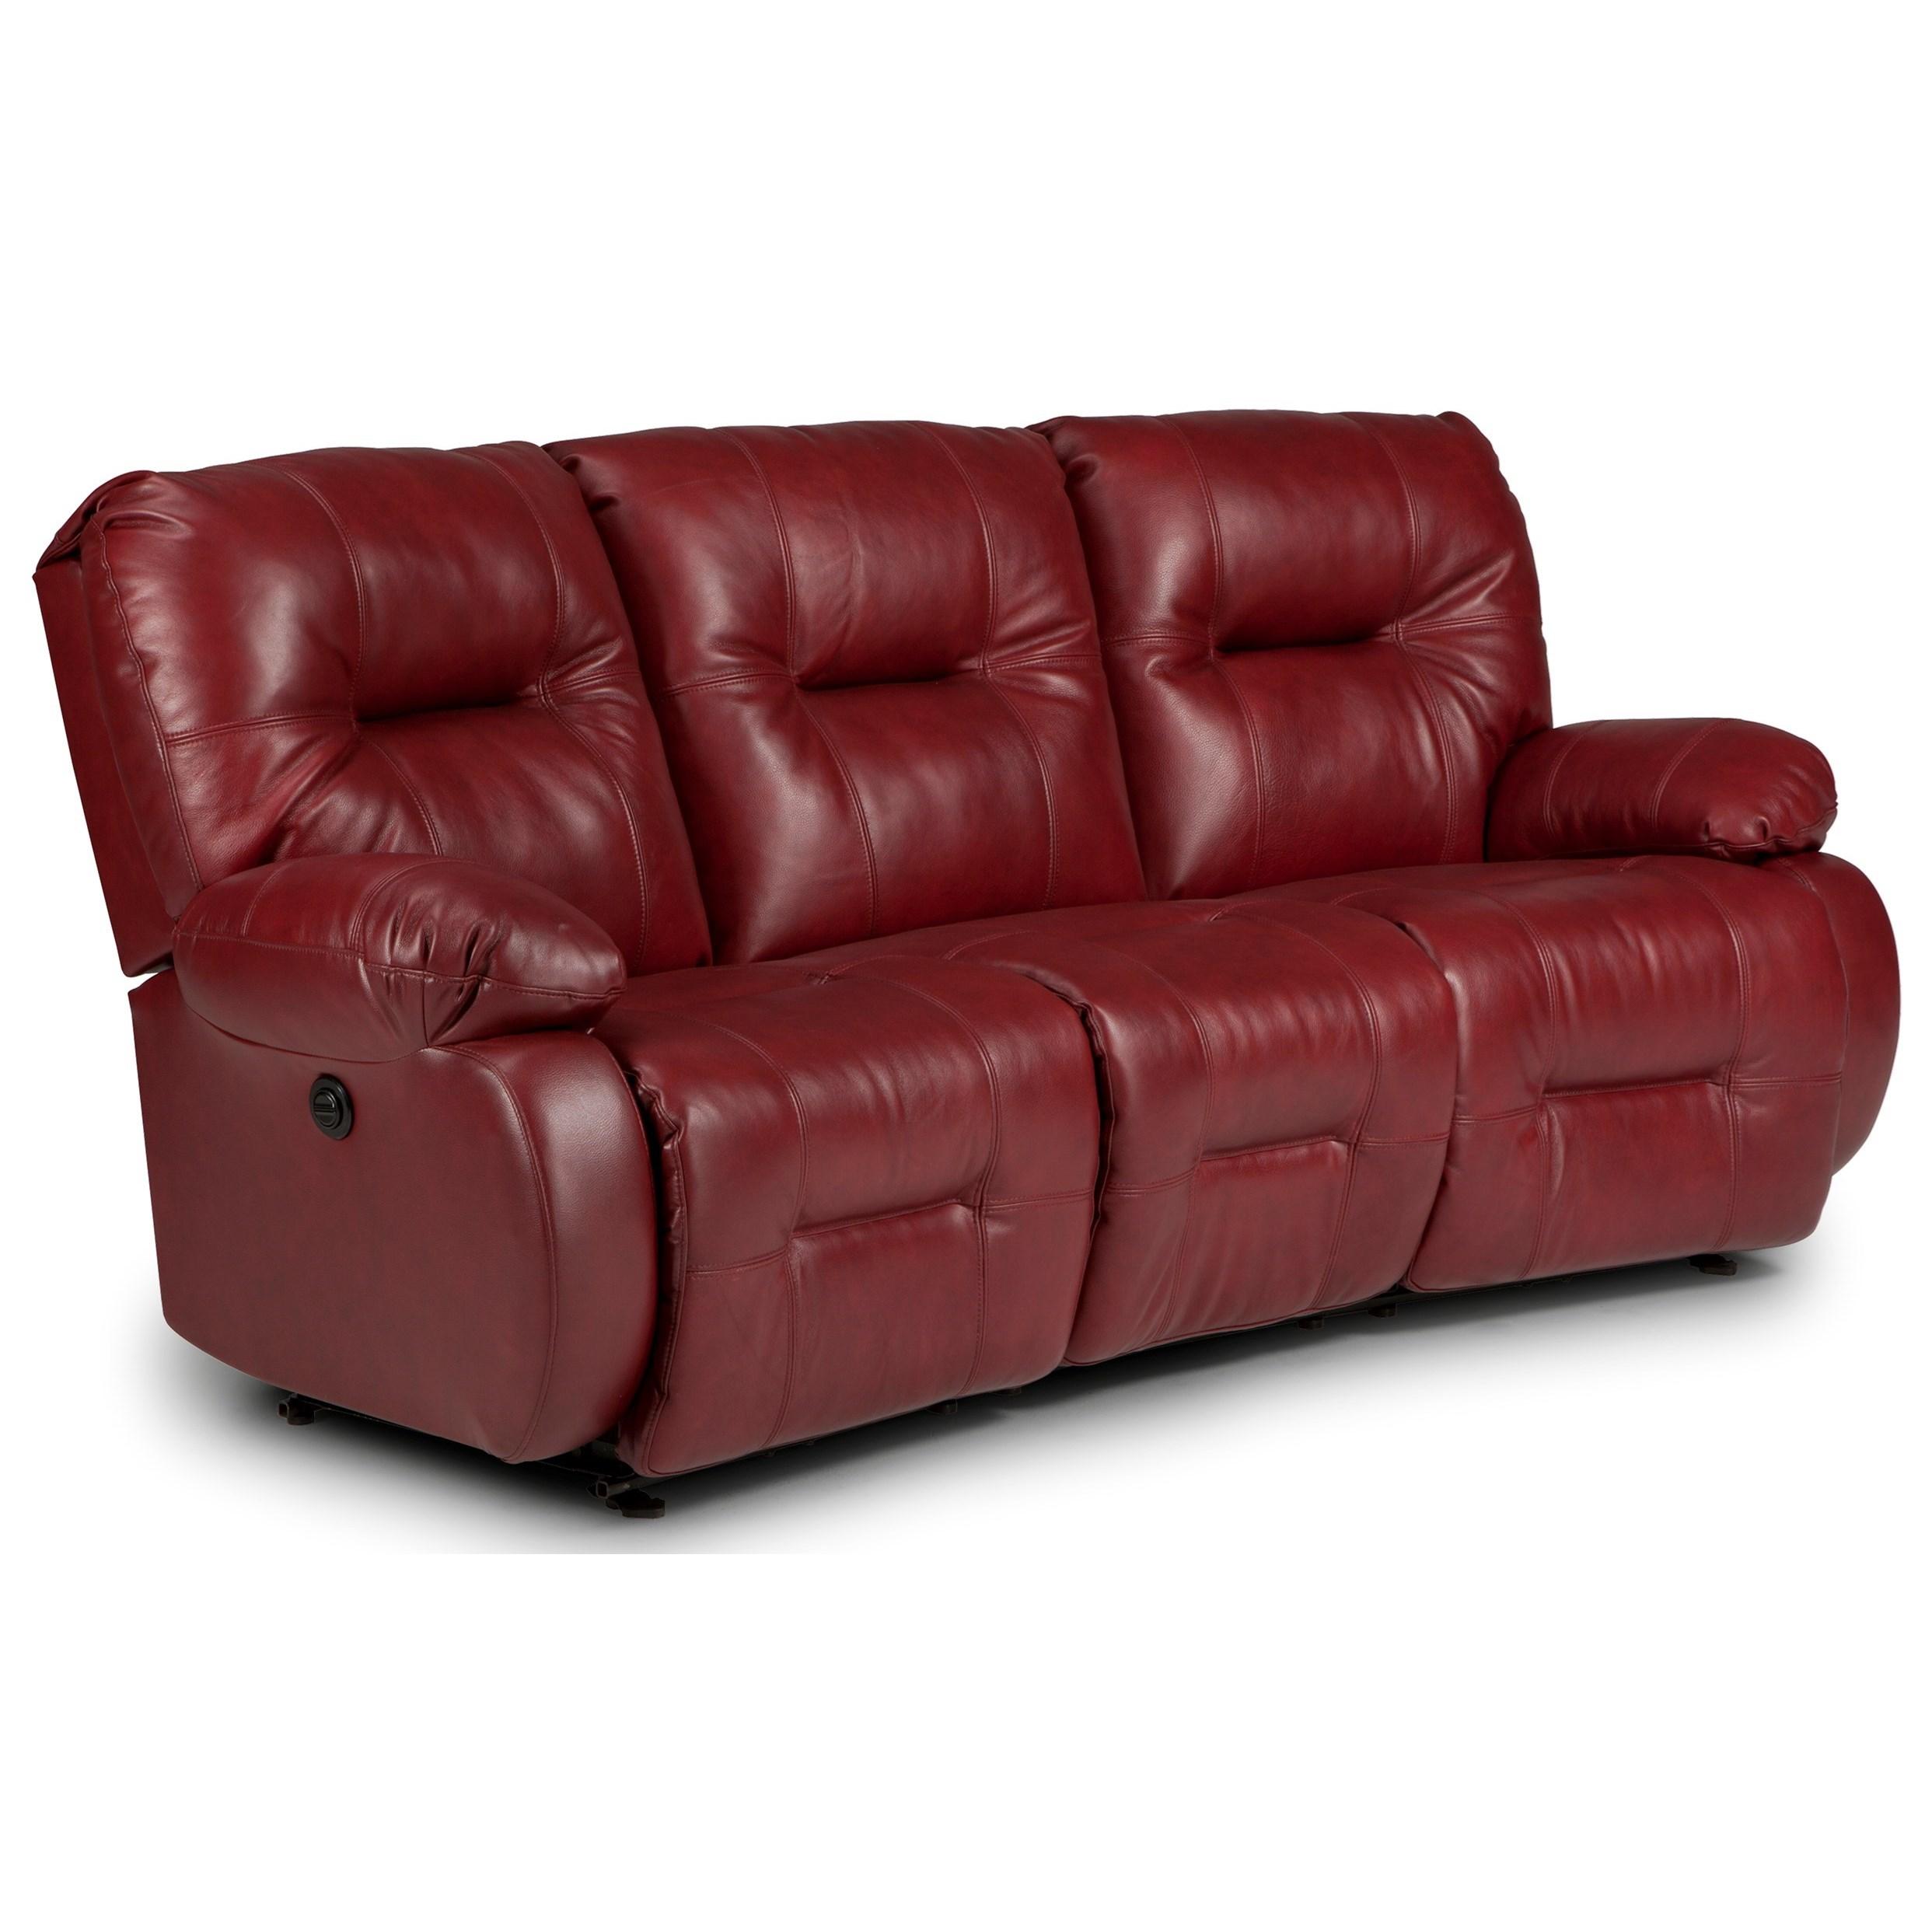 Power Reclining Sofa w/ Pwr Headrest